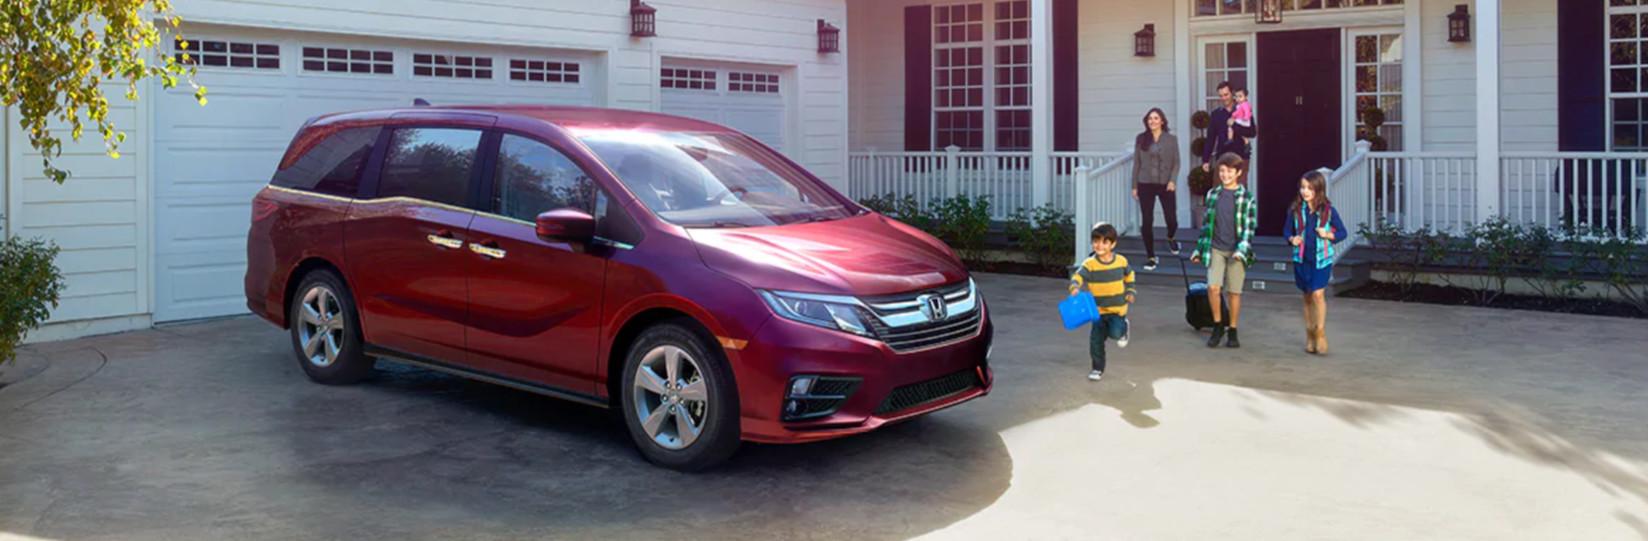 2020 Honda Odyssey Leasing near Alexandria, VA